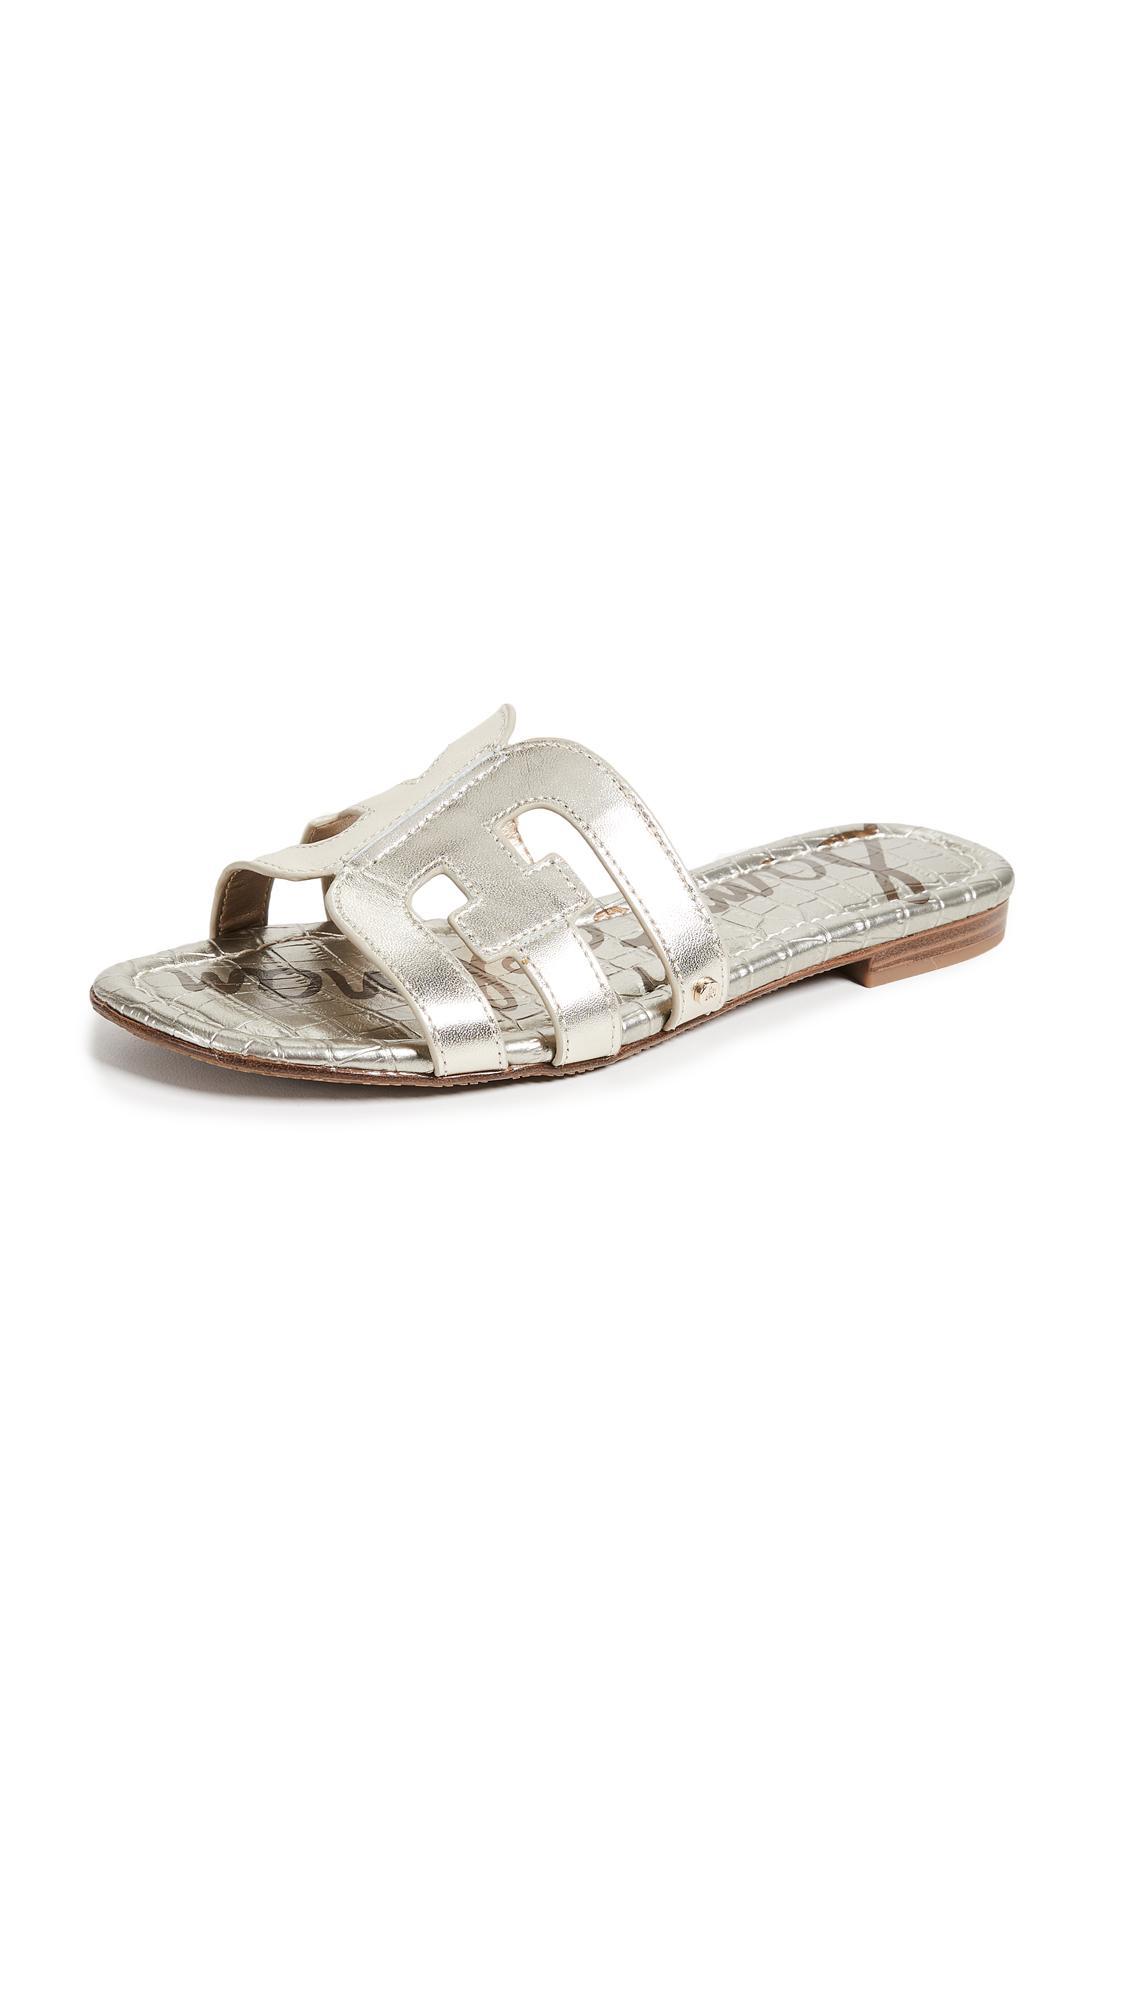 f9ebff636 Sam Edelman Women s Bay Leather Slide Sandals In Jute